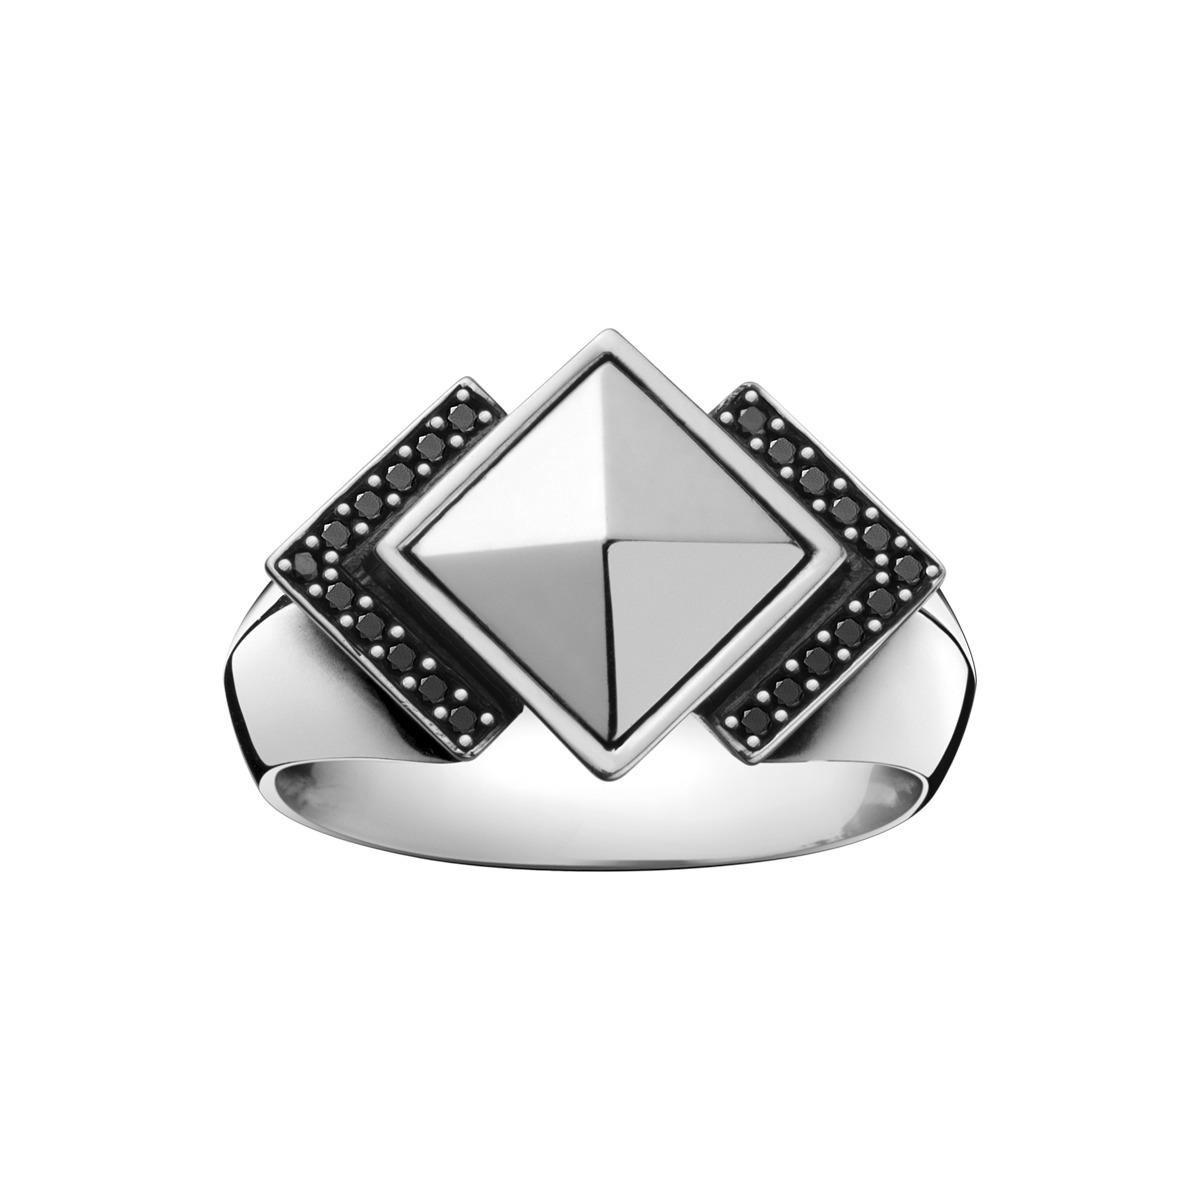 Image of   Georg Jensen NOCTURNE Ring med sort diamant - 3559720 Størrelse 58